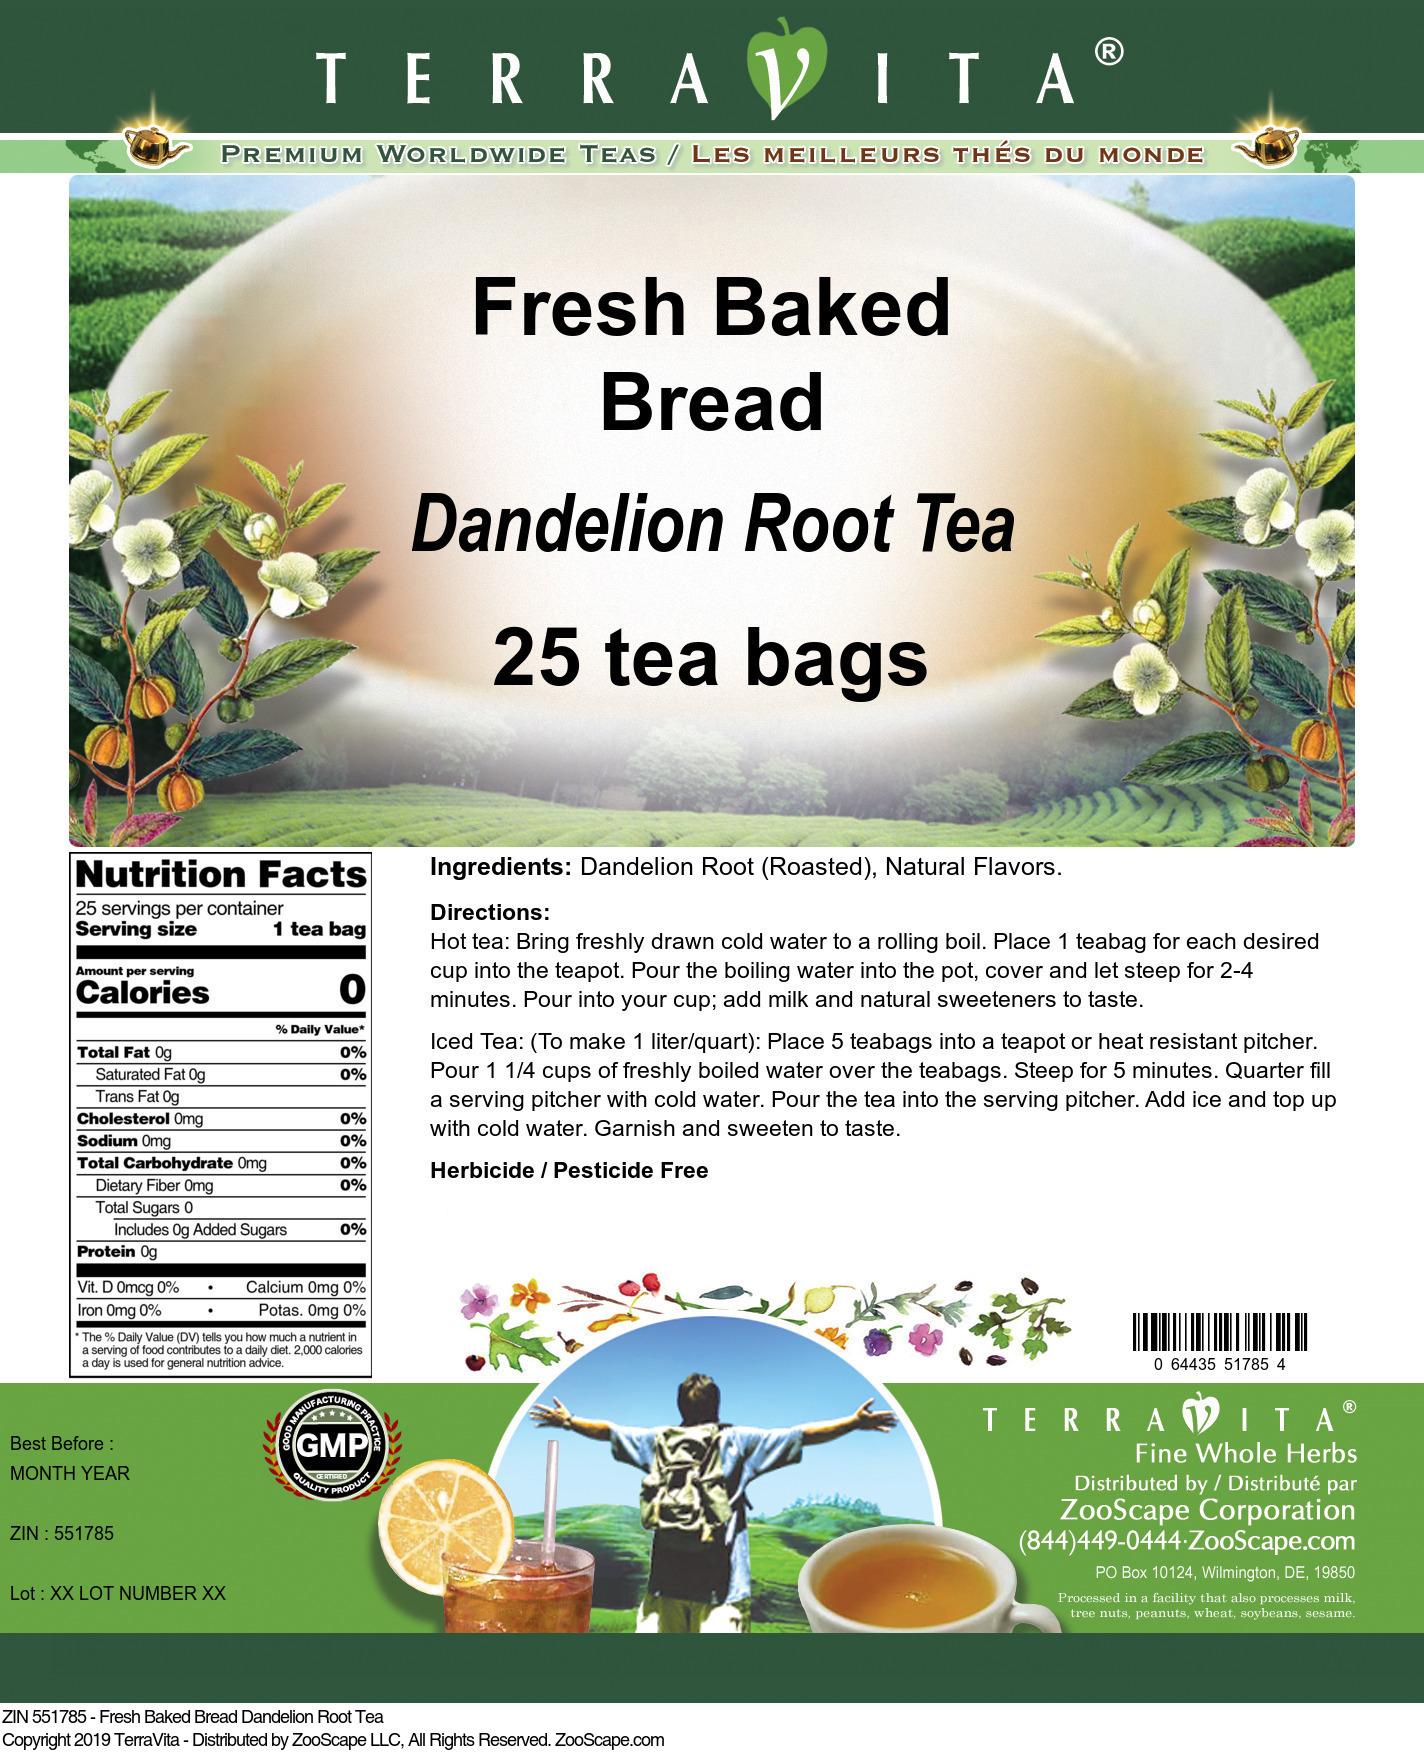 Fresh Baked Bread Dandelion Root Tea